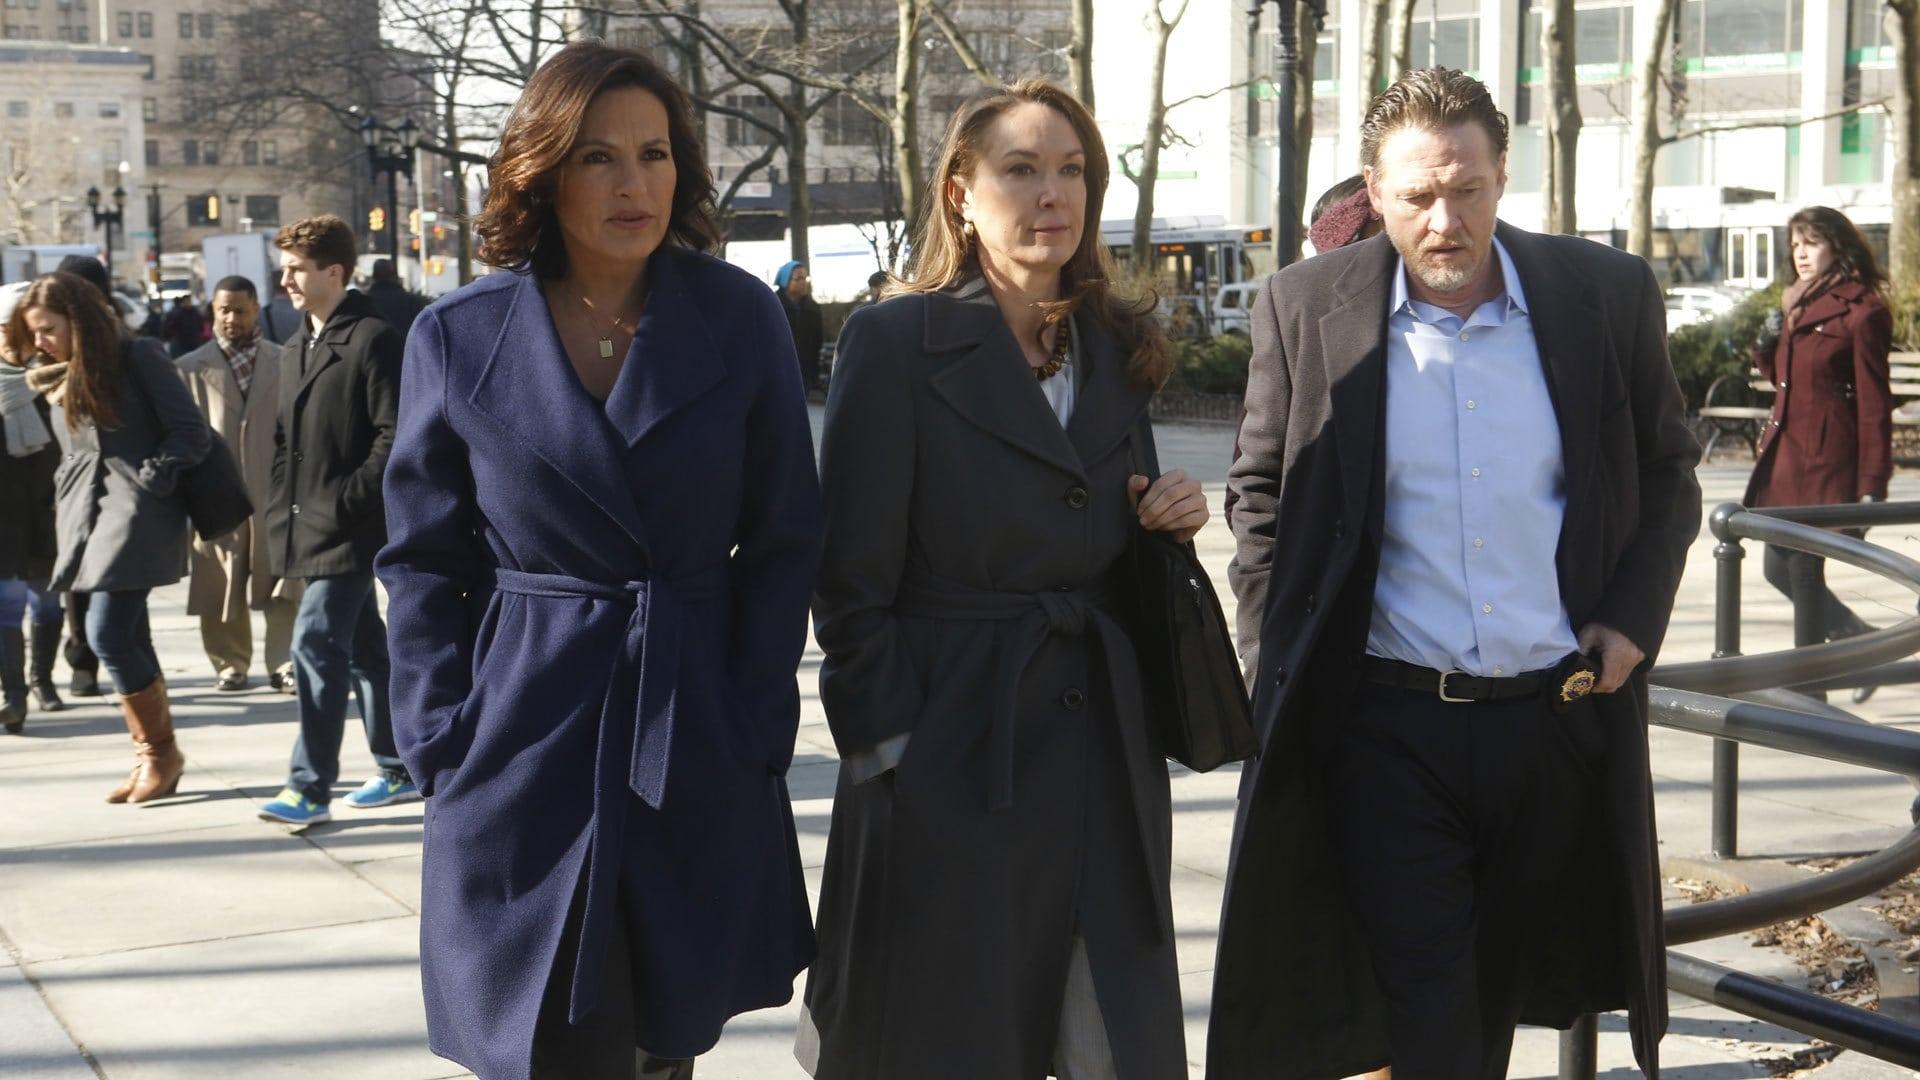 Law & Order: Special Victims Unit - Season 15 Episode 21 : Post-Mortem Blues